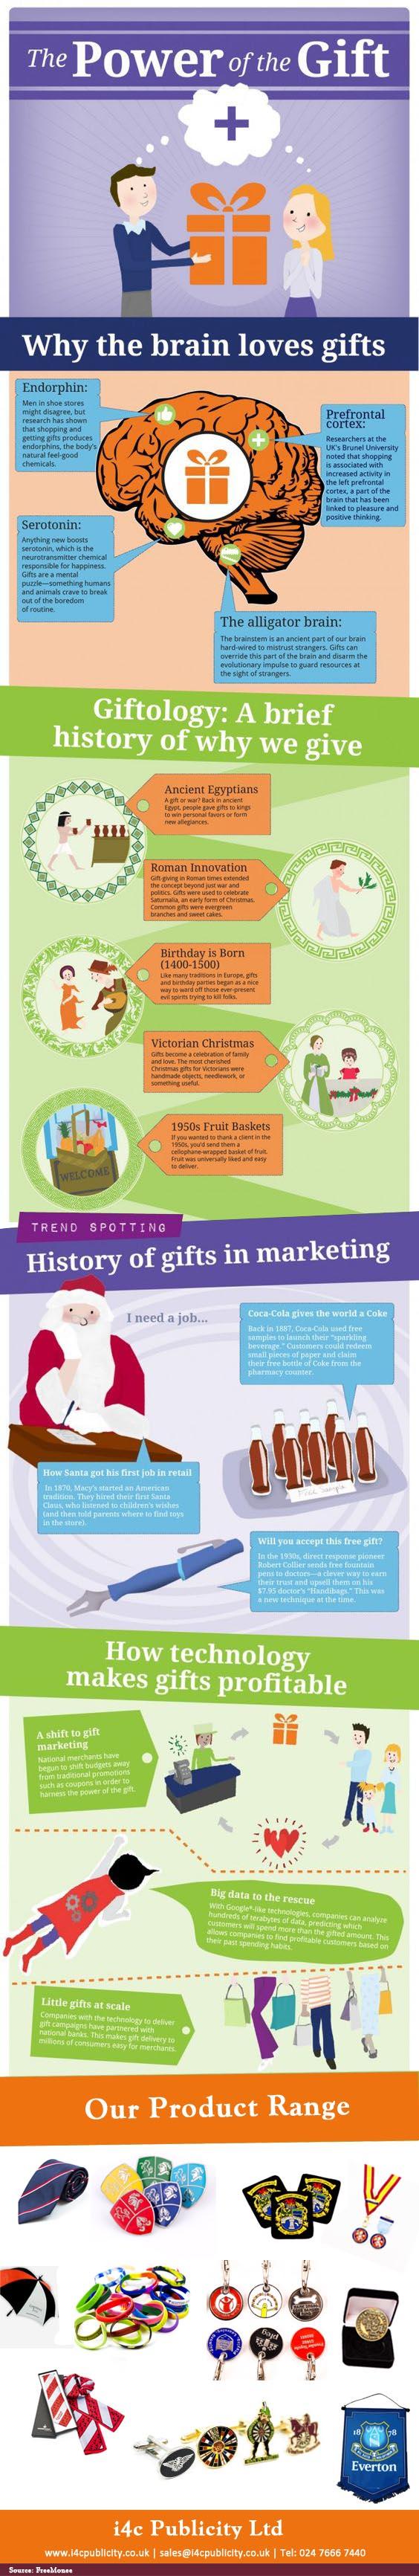 gifting, promotional merchandise, custom, personalised